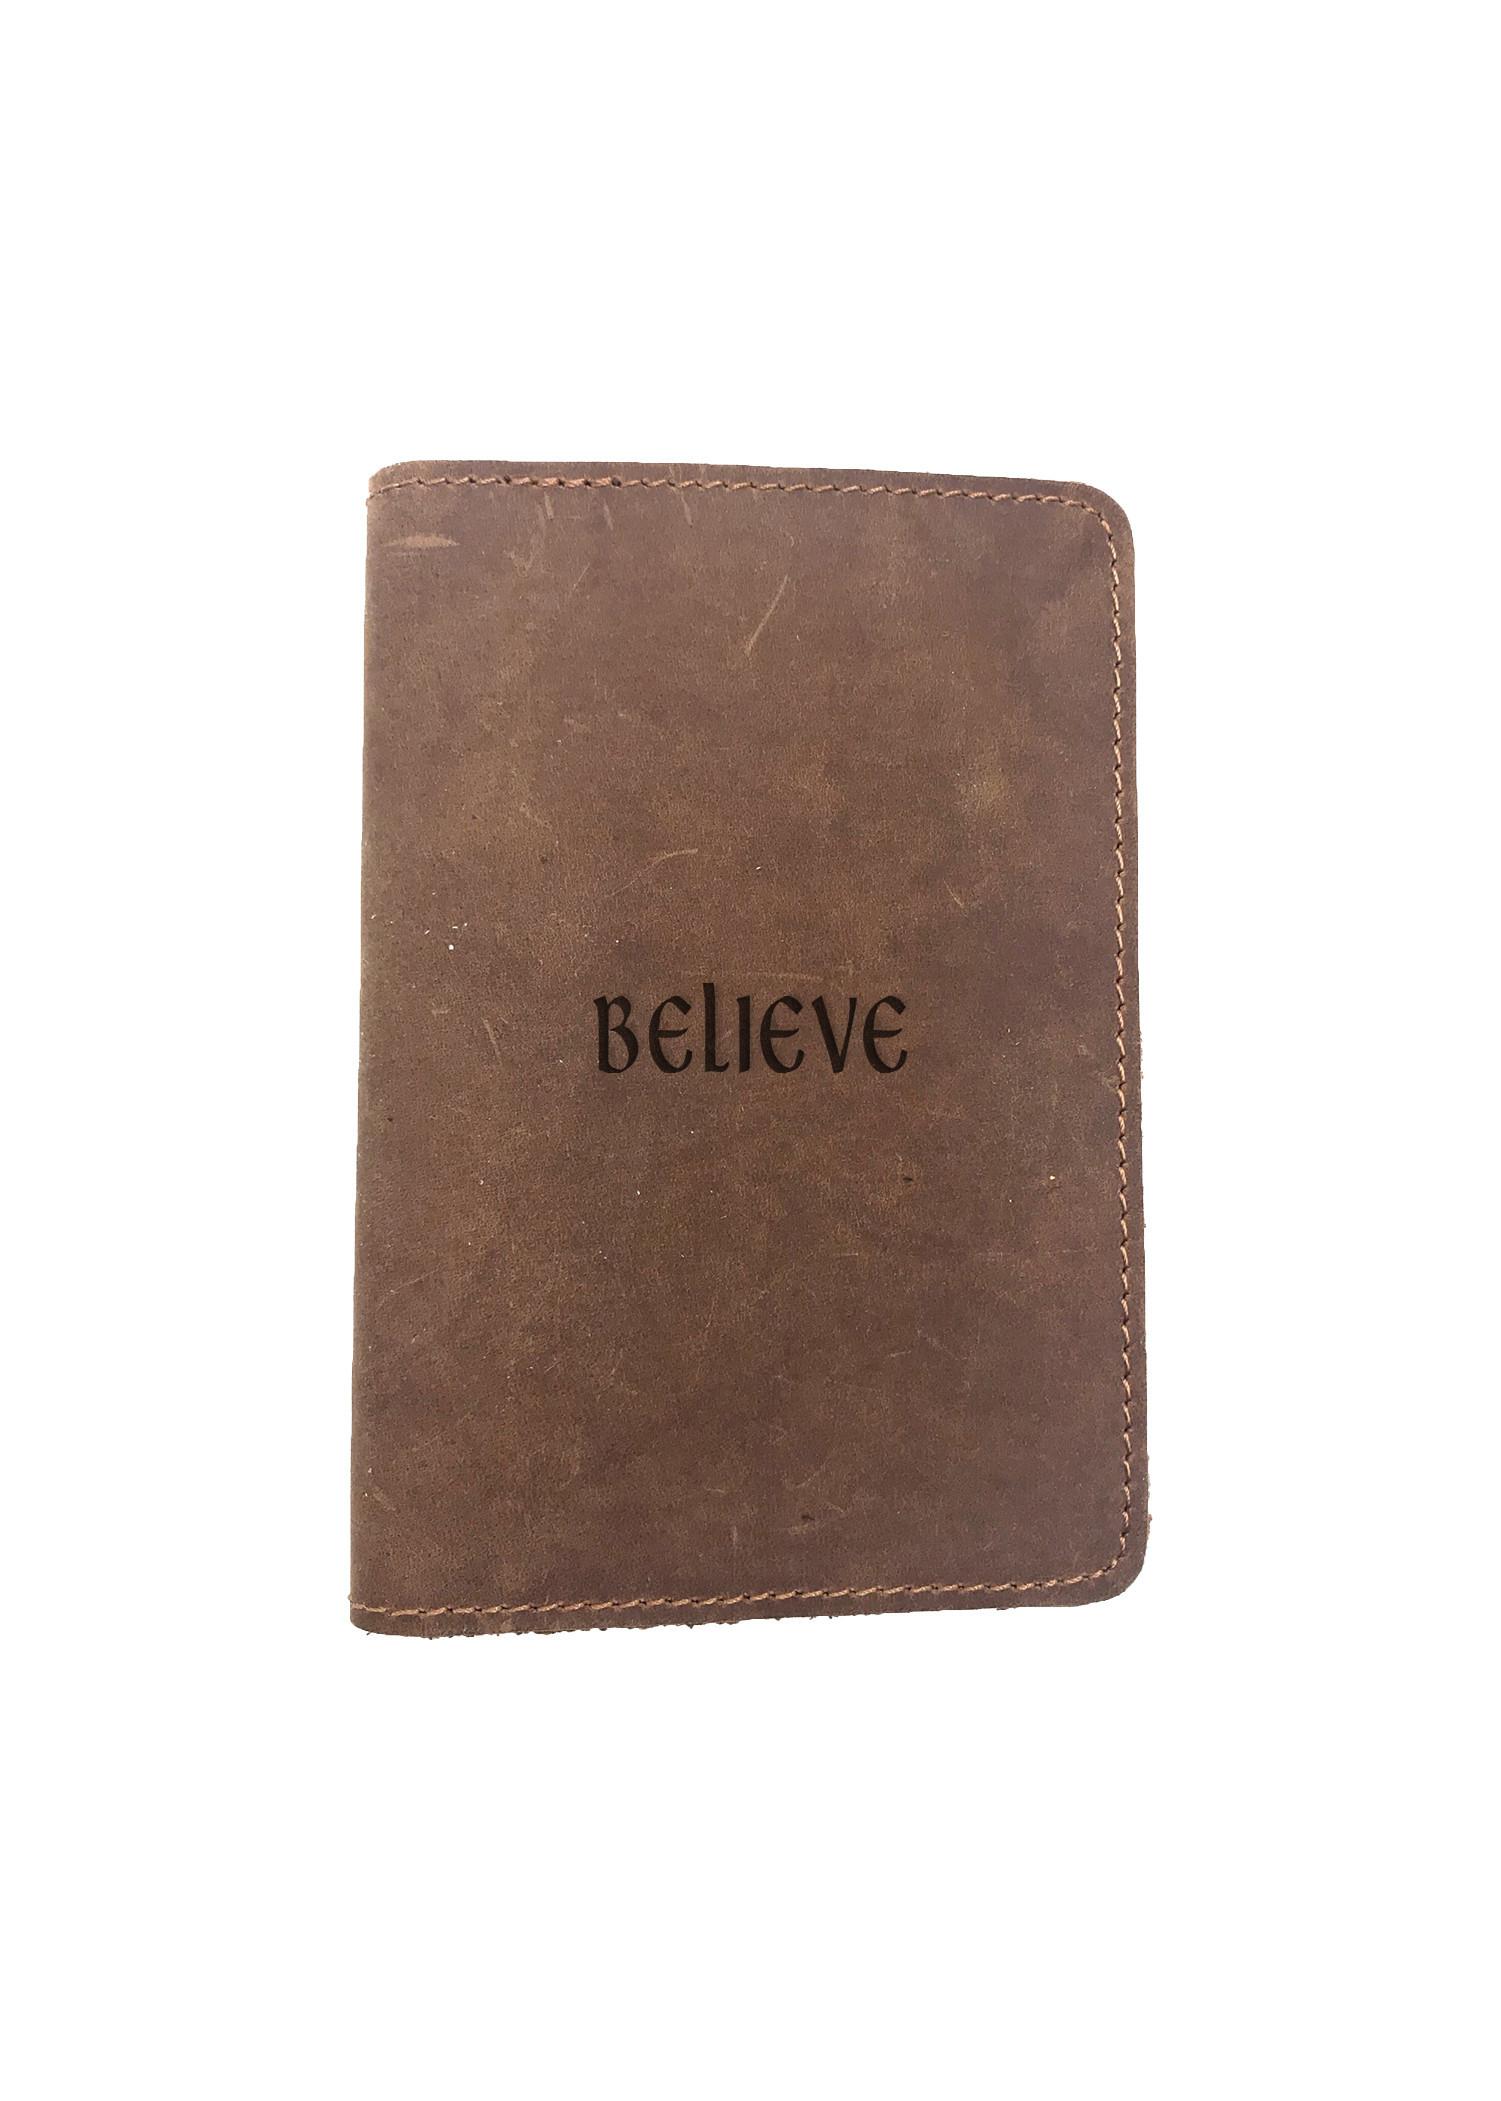 Passport Cover Bao Da Hộ Chiếu Da Sáp Khắc Hình Chữ BELIEVE TEXT (BROWN)